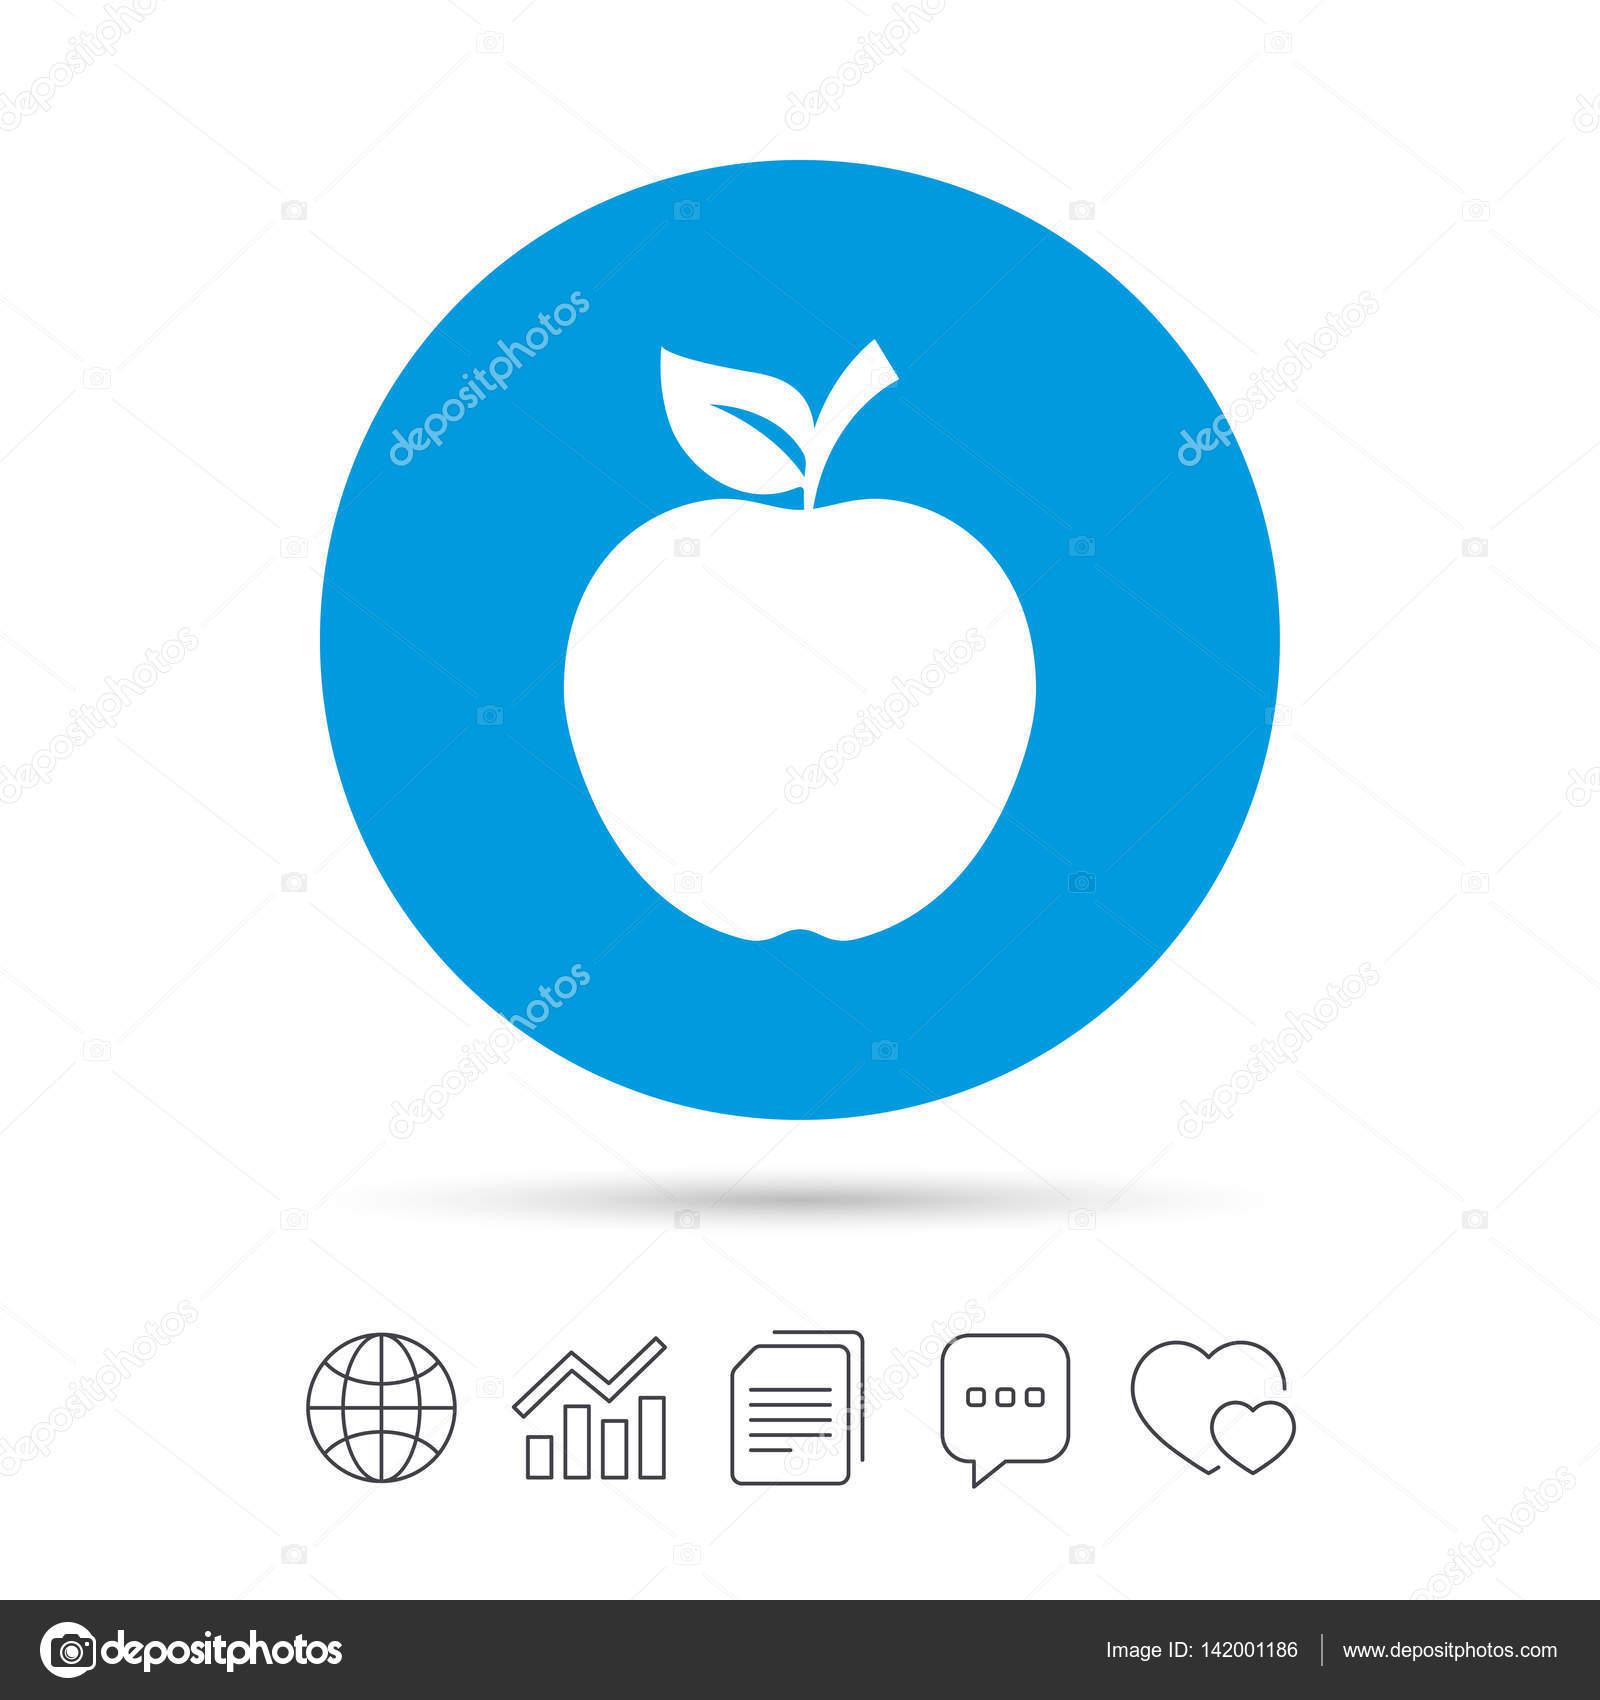 apple sign icon — stock vector © blankstock #142001186